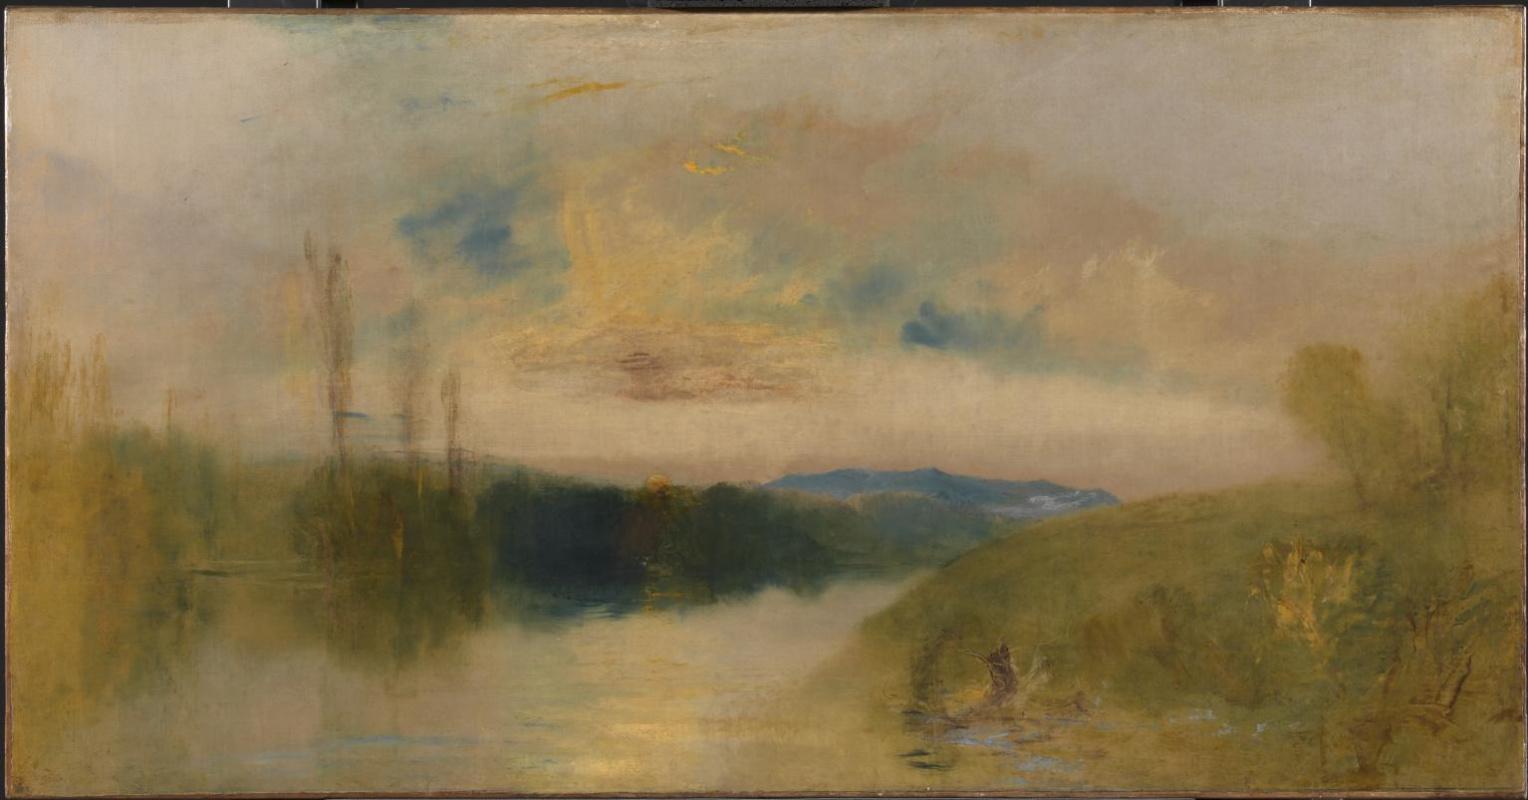 Joseph Mallord William Turner. The lake in Petworth